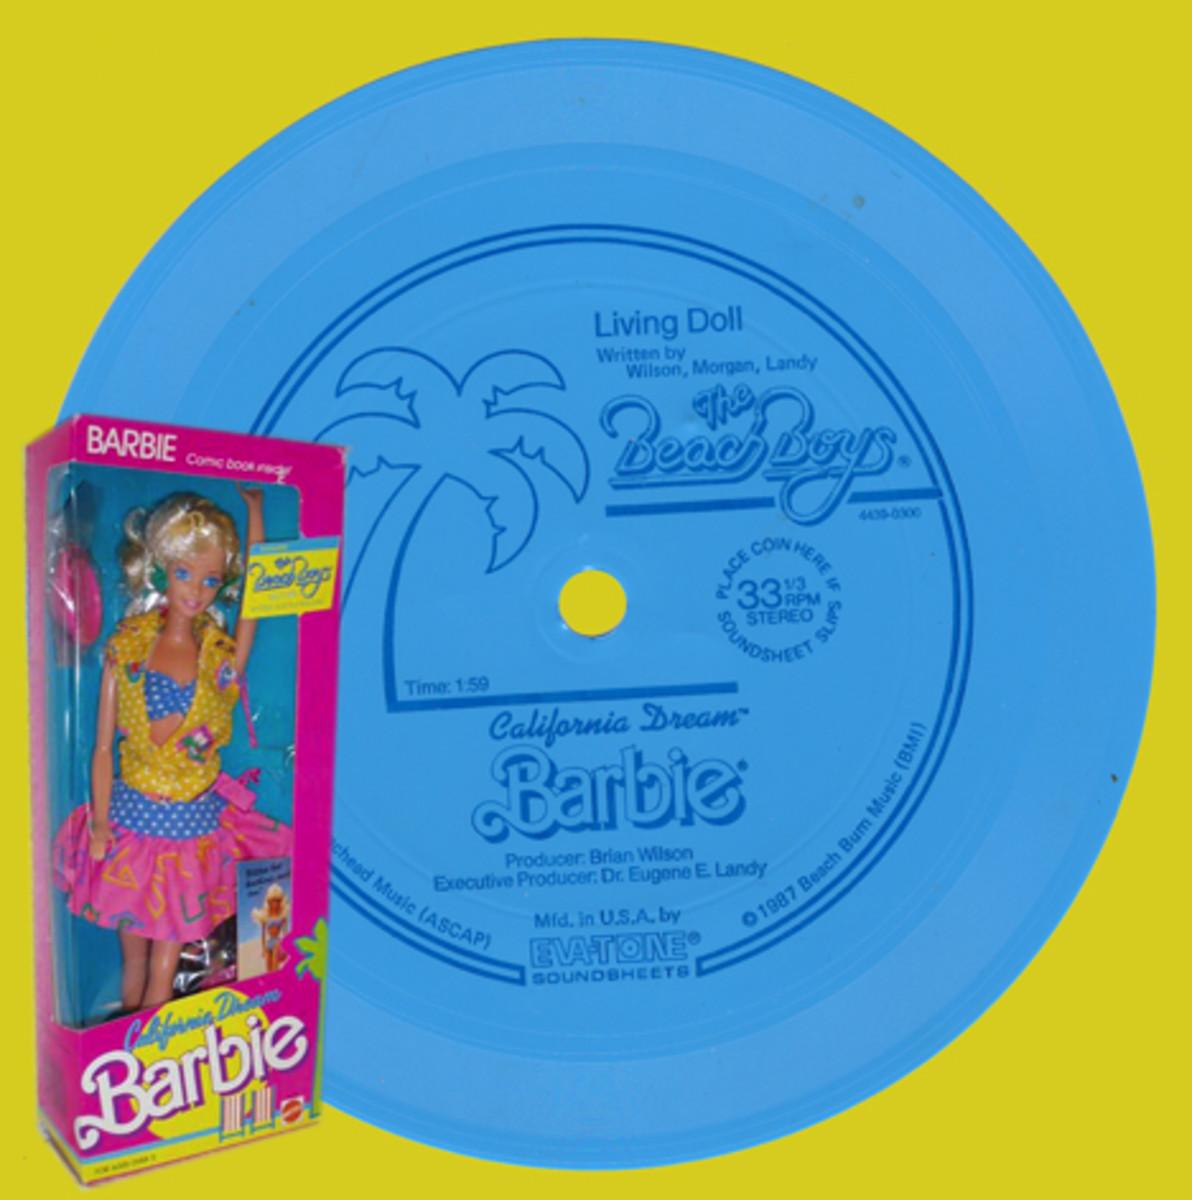 Eva-Tone's 1987 Living Doll flexidisc by Brian Wilson of The Beach Boys